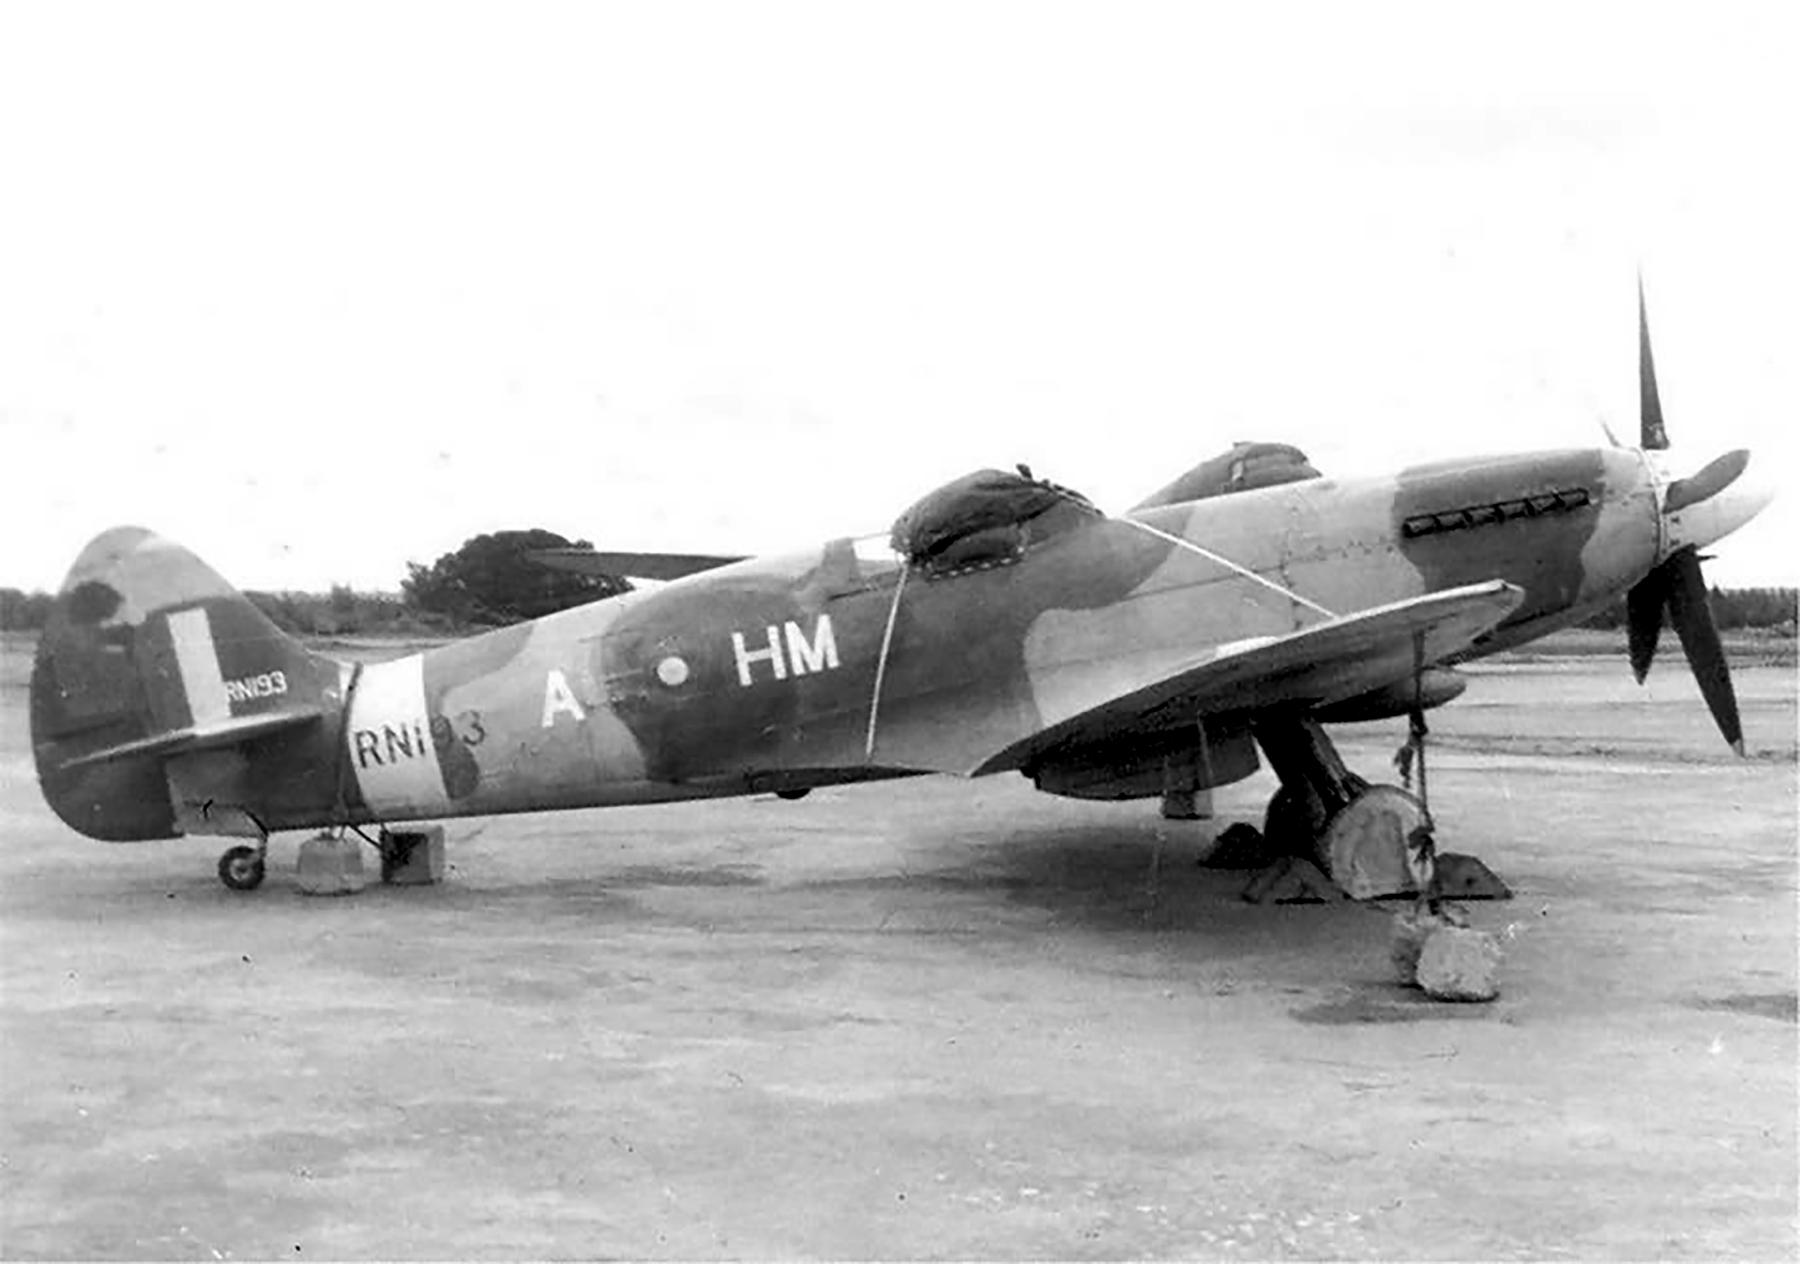 Spitfire XIV RAF 136Sqn HMA RN193 India 1946 47 web 01